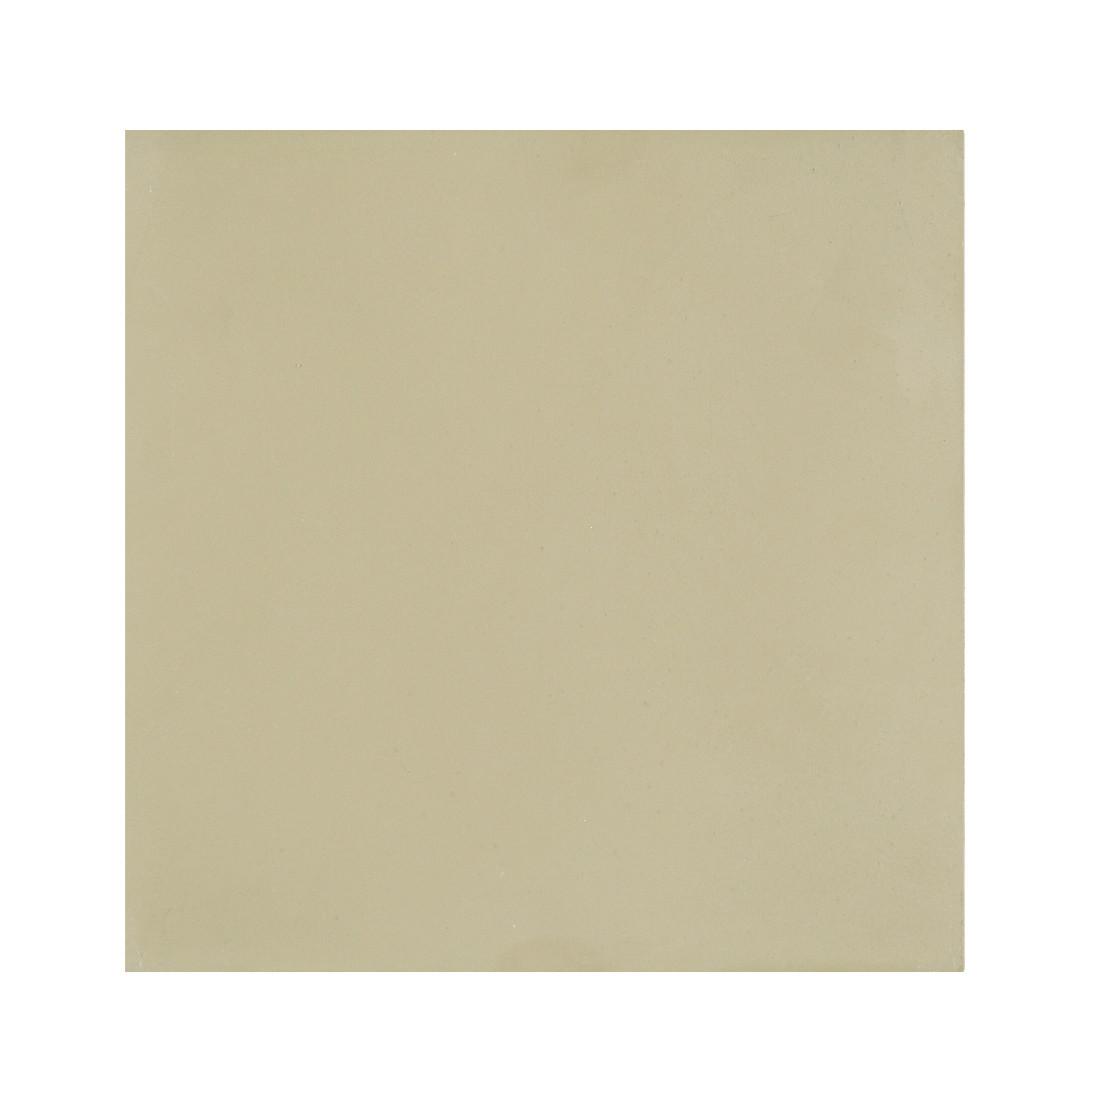 Concrete Pitaschio